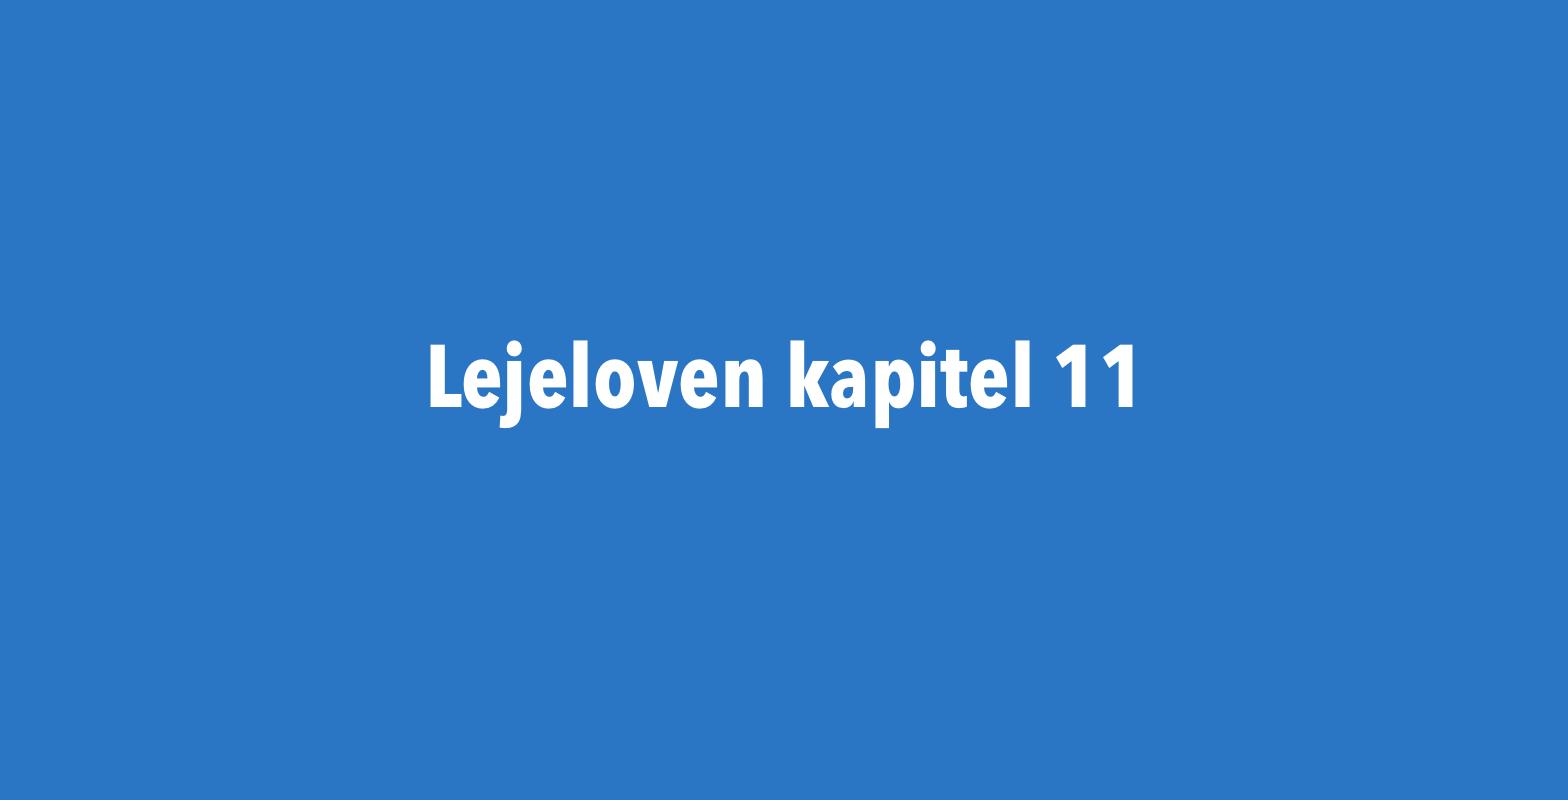 Lejelovens kapital 11